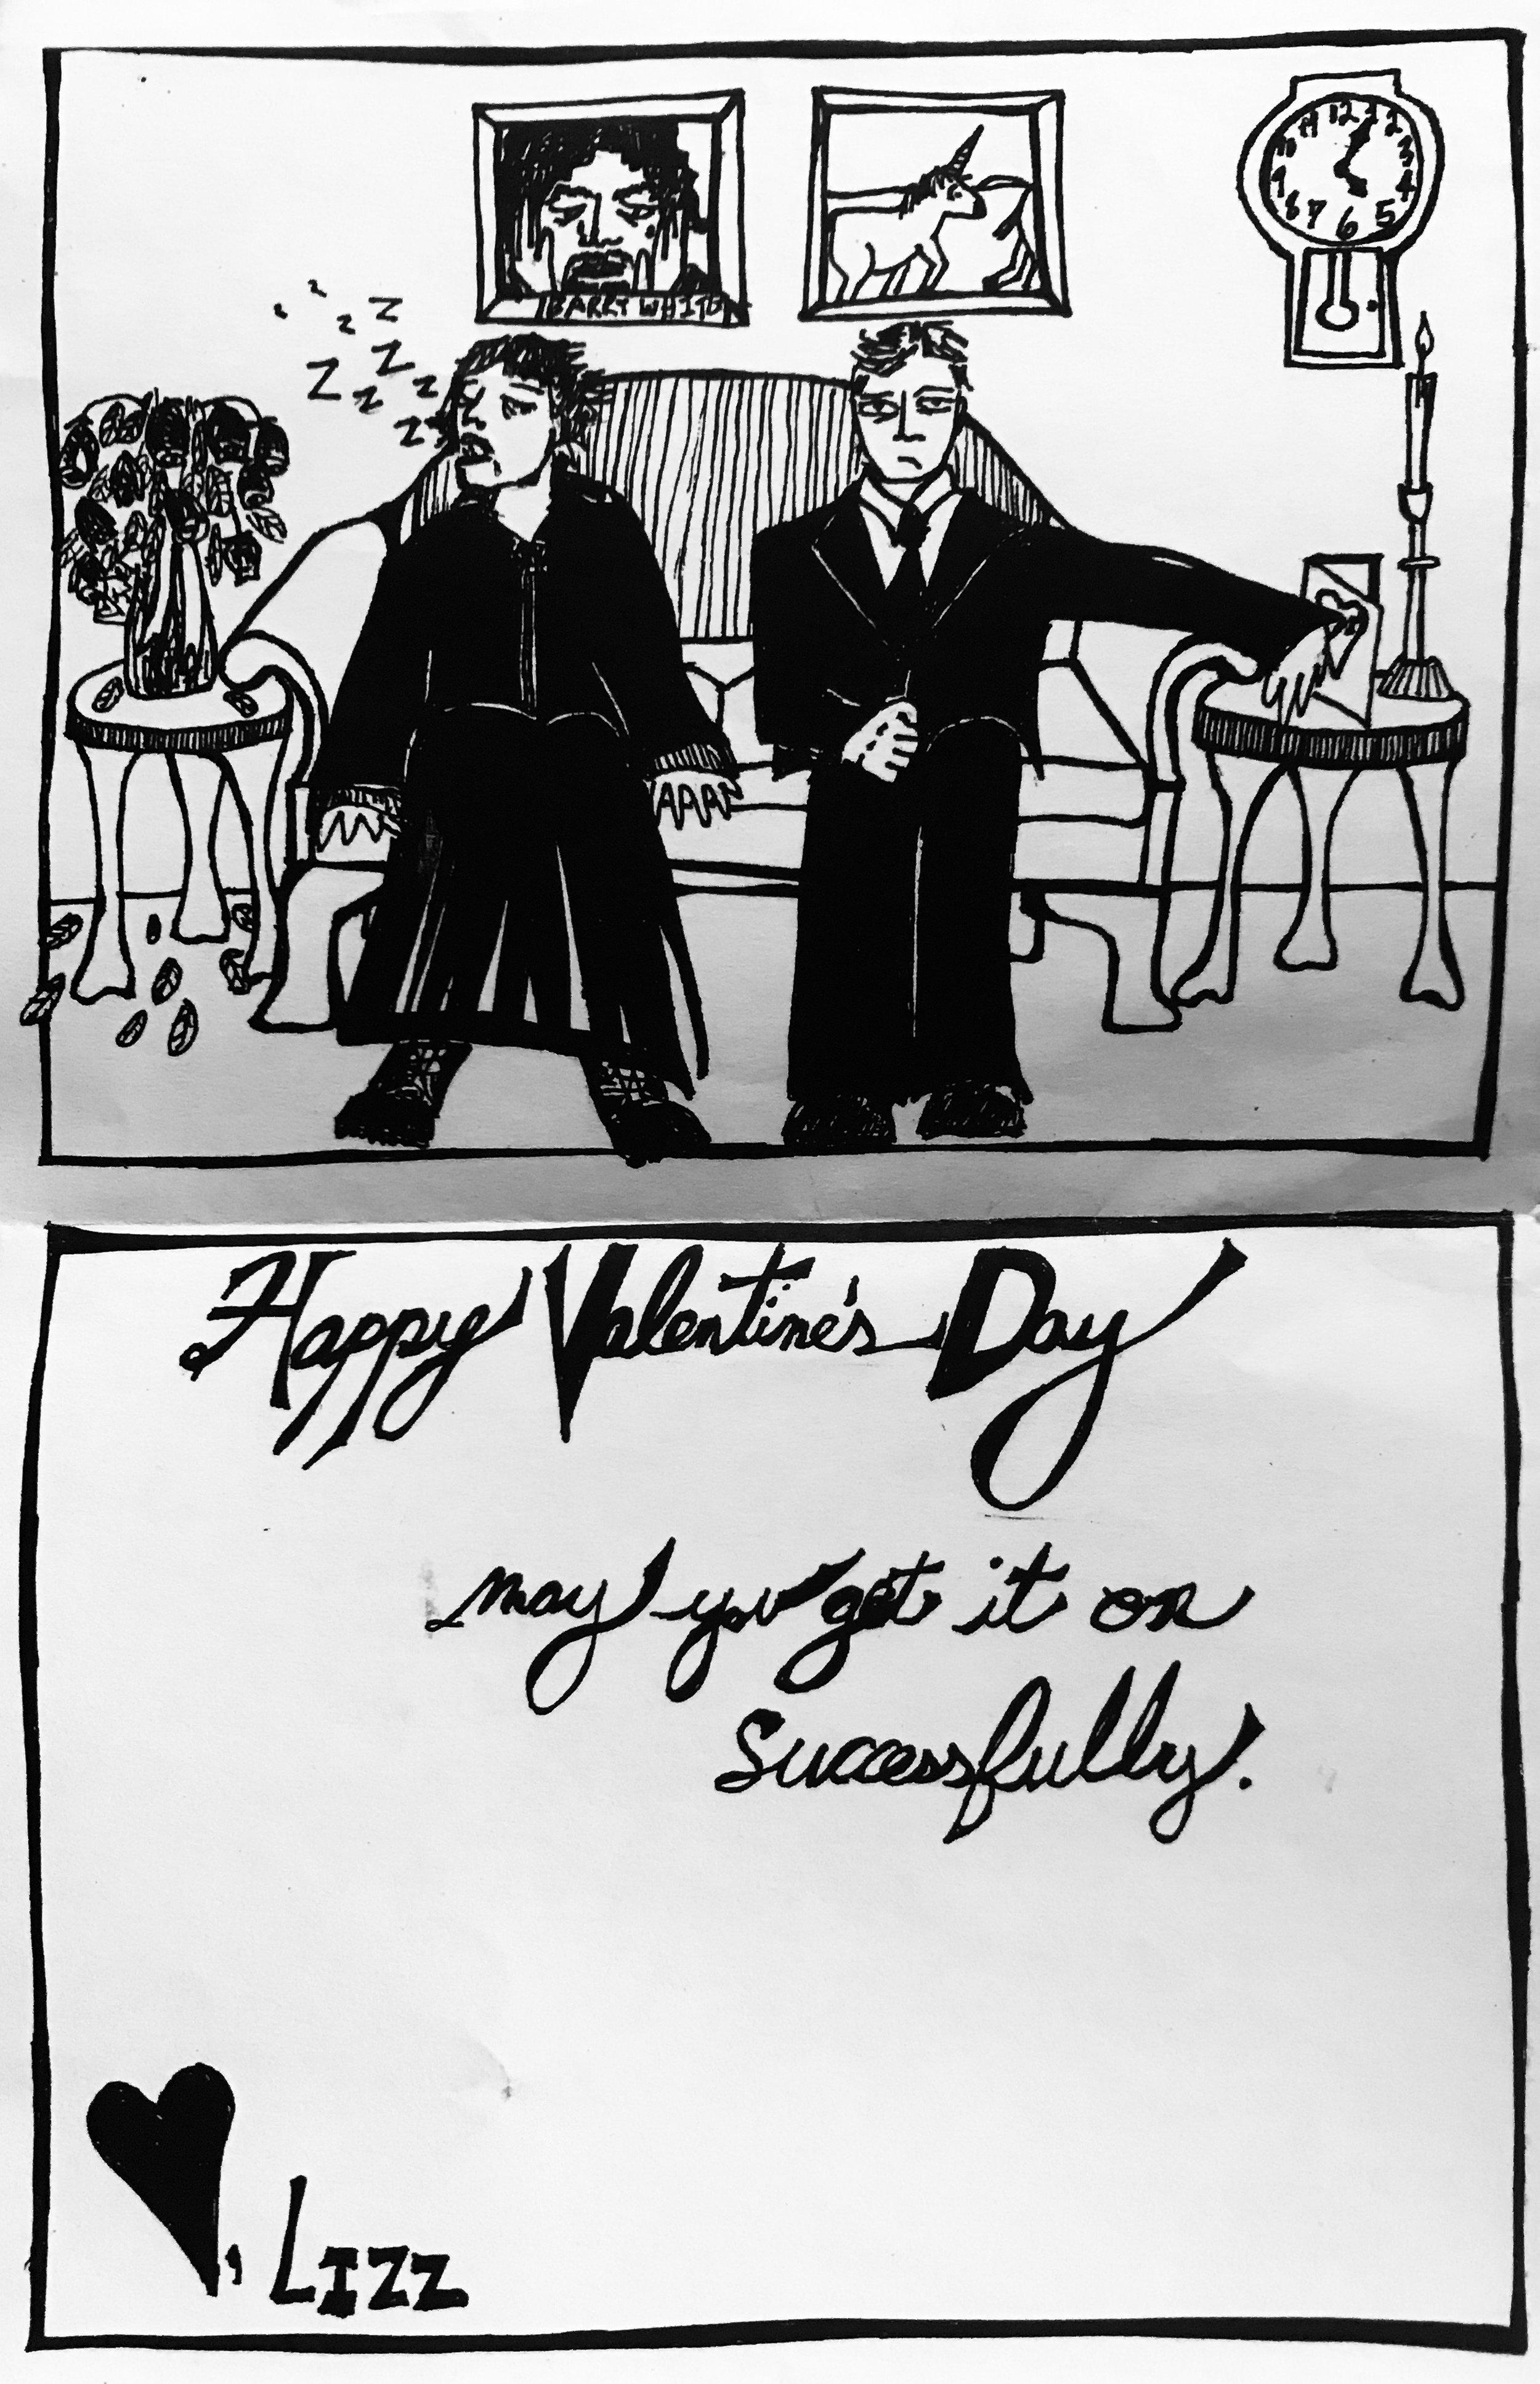 Valentine's Day Card (2005) / Full Panel